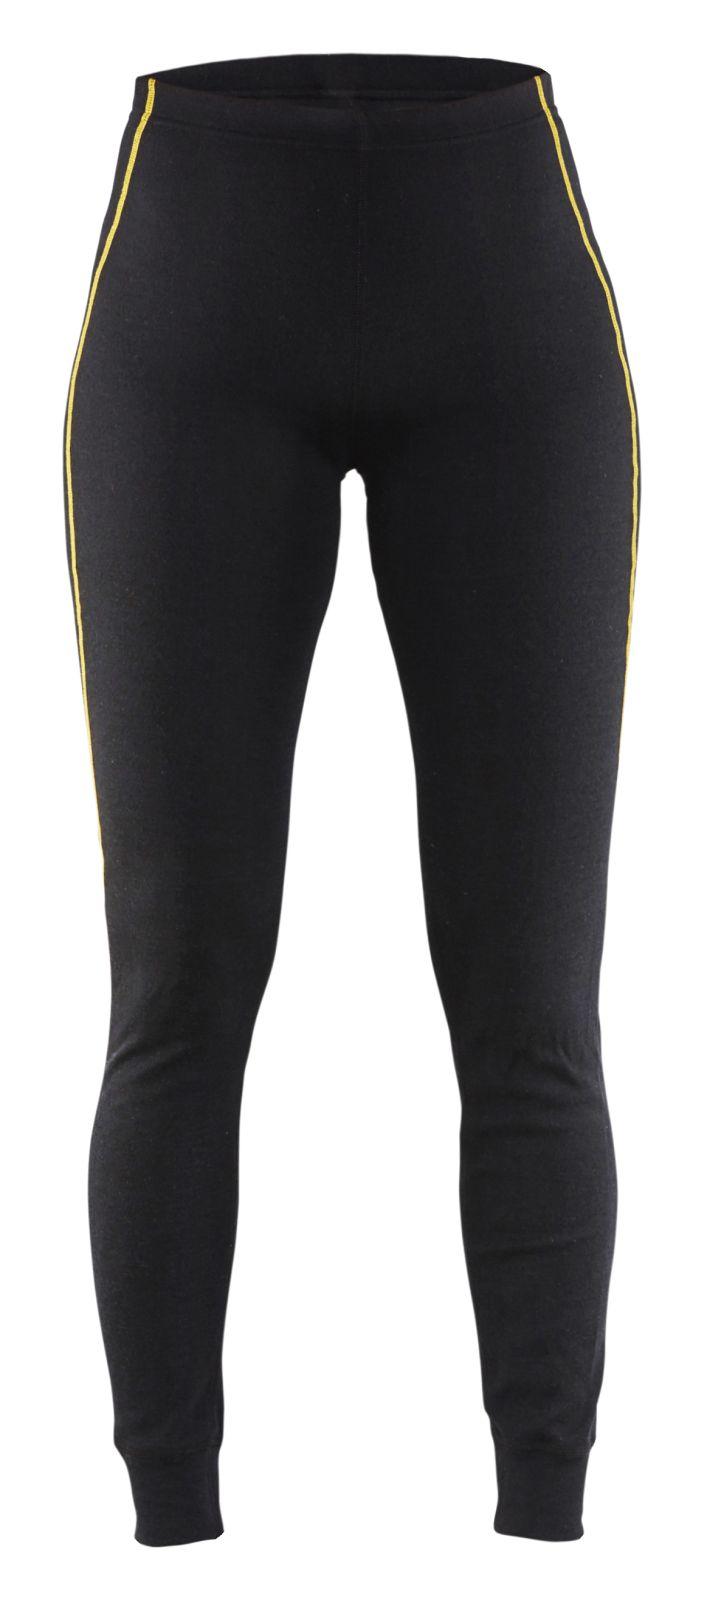 Blaklader Dames lange onderbroeken 72031075 Vlamvertragend zwart(9900)